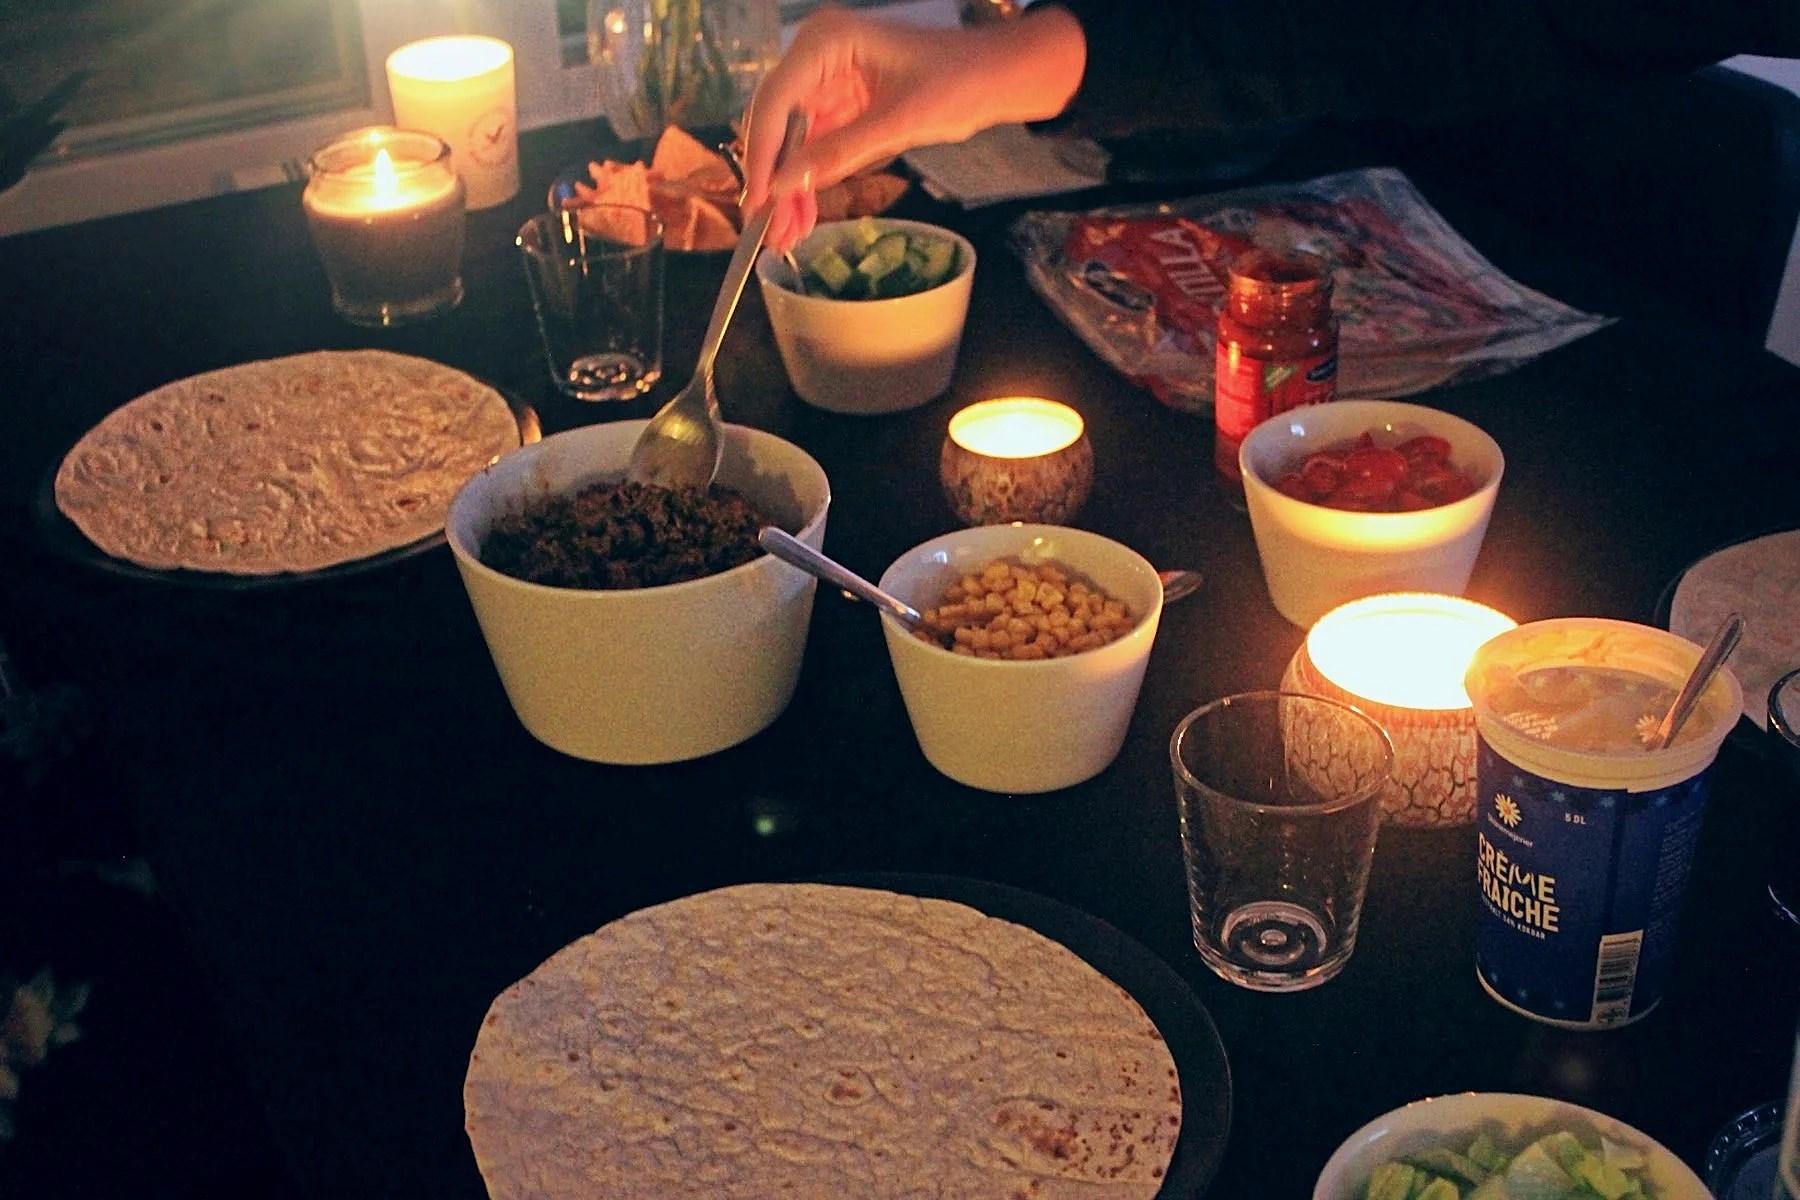 Taco-fredag & Fondue-lördag.